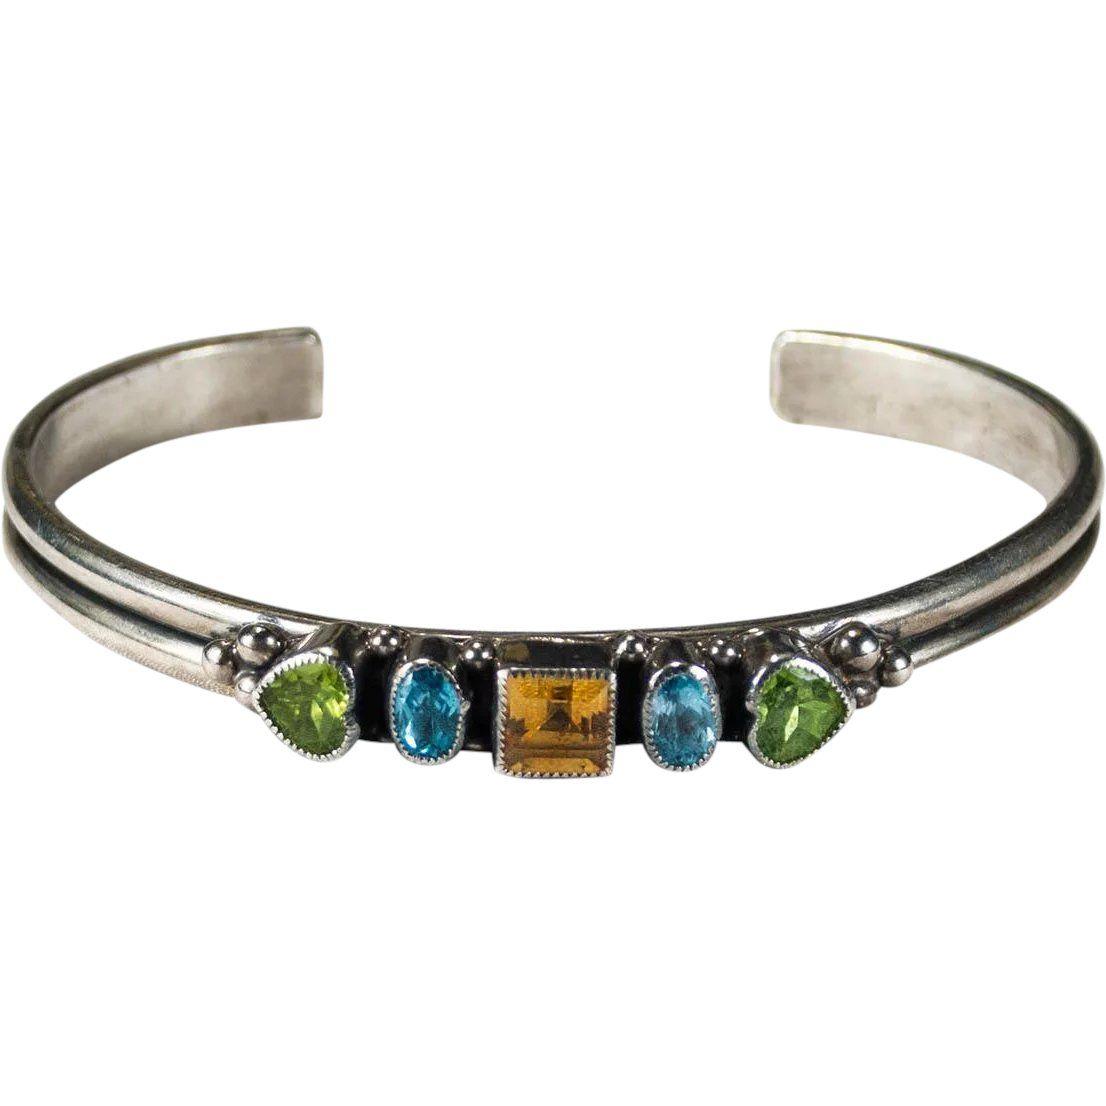 07c09c08c43 Gemstone Cuff by Susan Kinzig - Amethyst, Garnet, Iolite & Vesonite (Silver  & Stone Bracelet) in 2019   Products   Jewelry, Stone bracelet, Bracelets